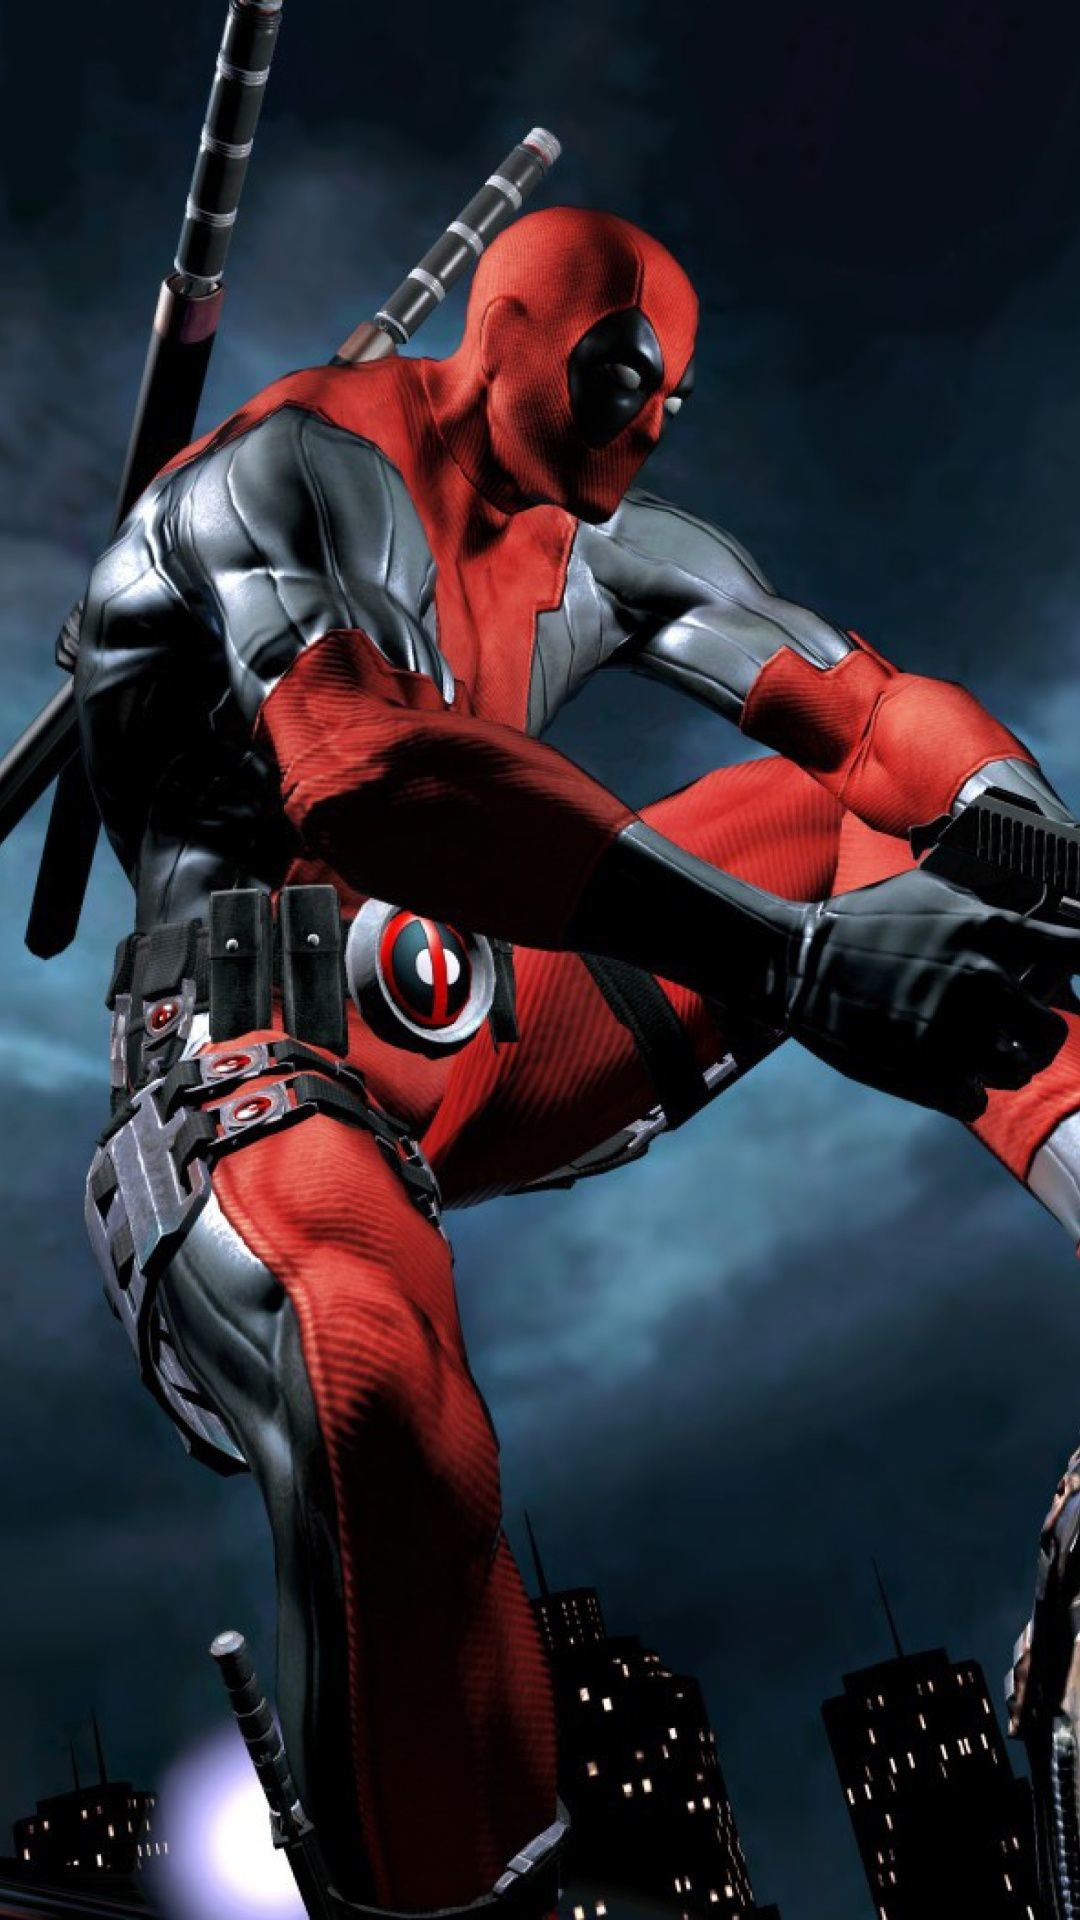 4k deadpool wallpaper 56 images - Deadpool download 1080p ...